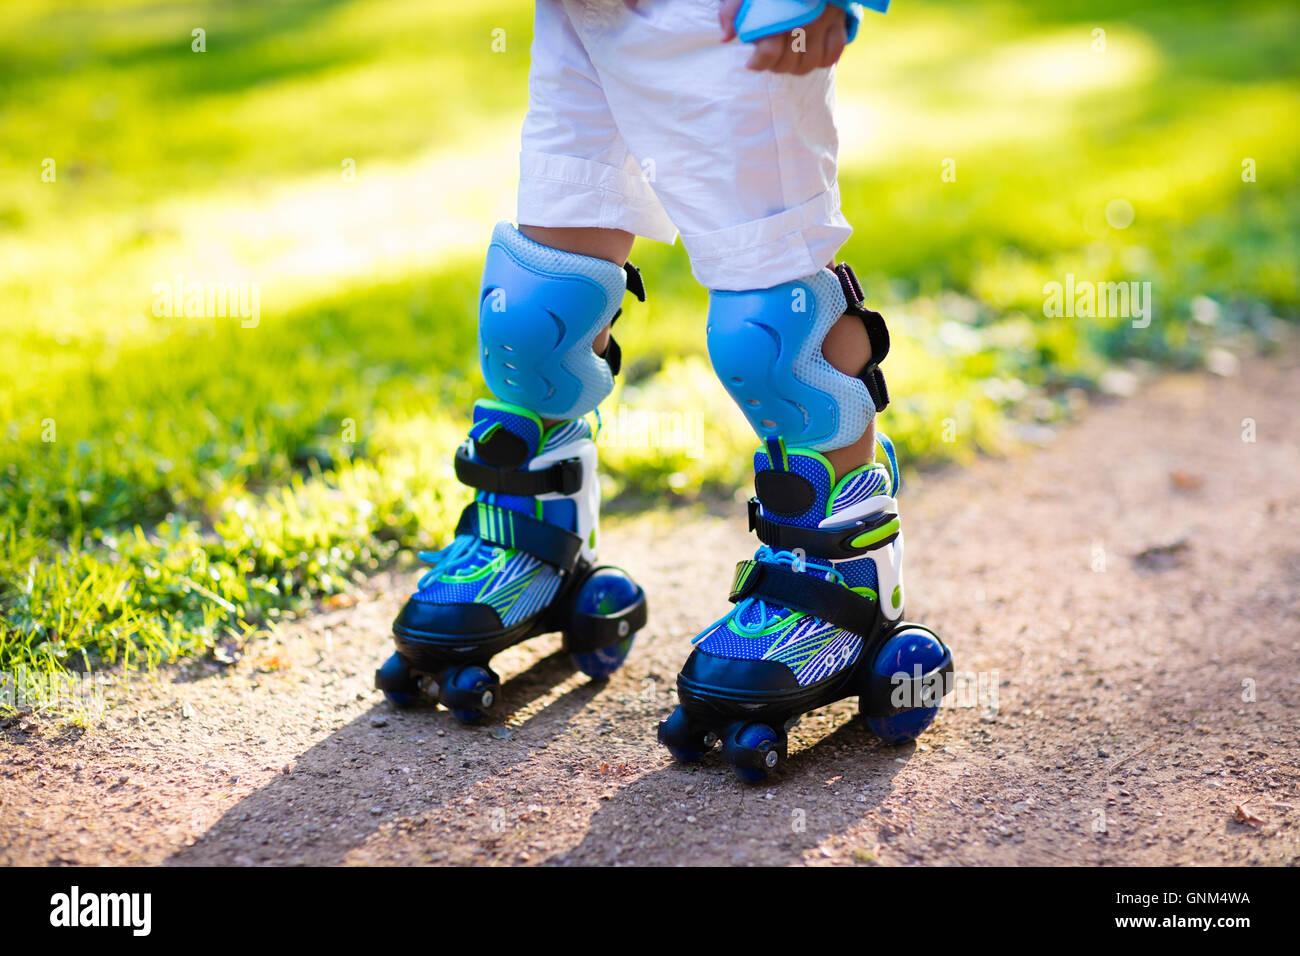 Roller skates winnipeg - Little Girl Learning To Roller Skate In Sunny Summer Park Child Wearing Protection Elbow And